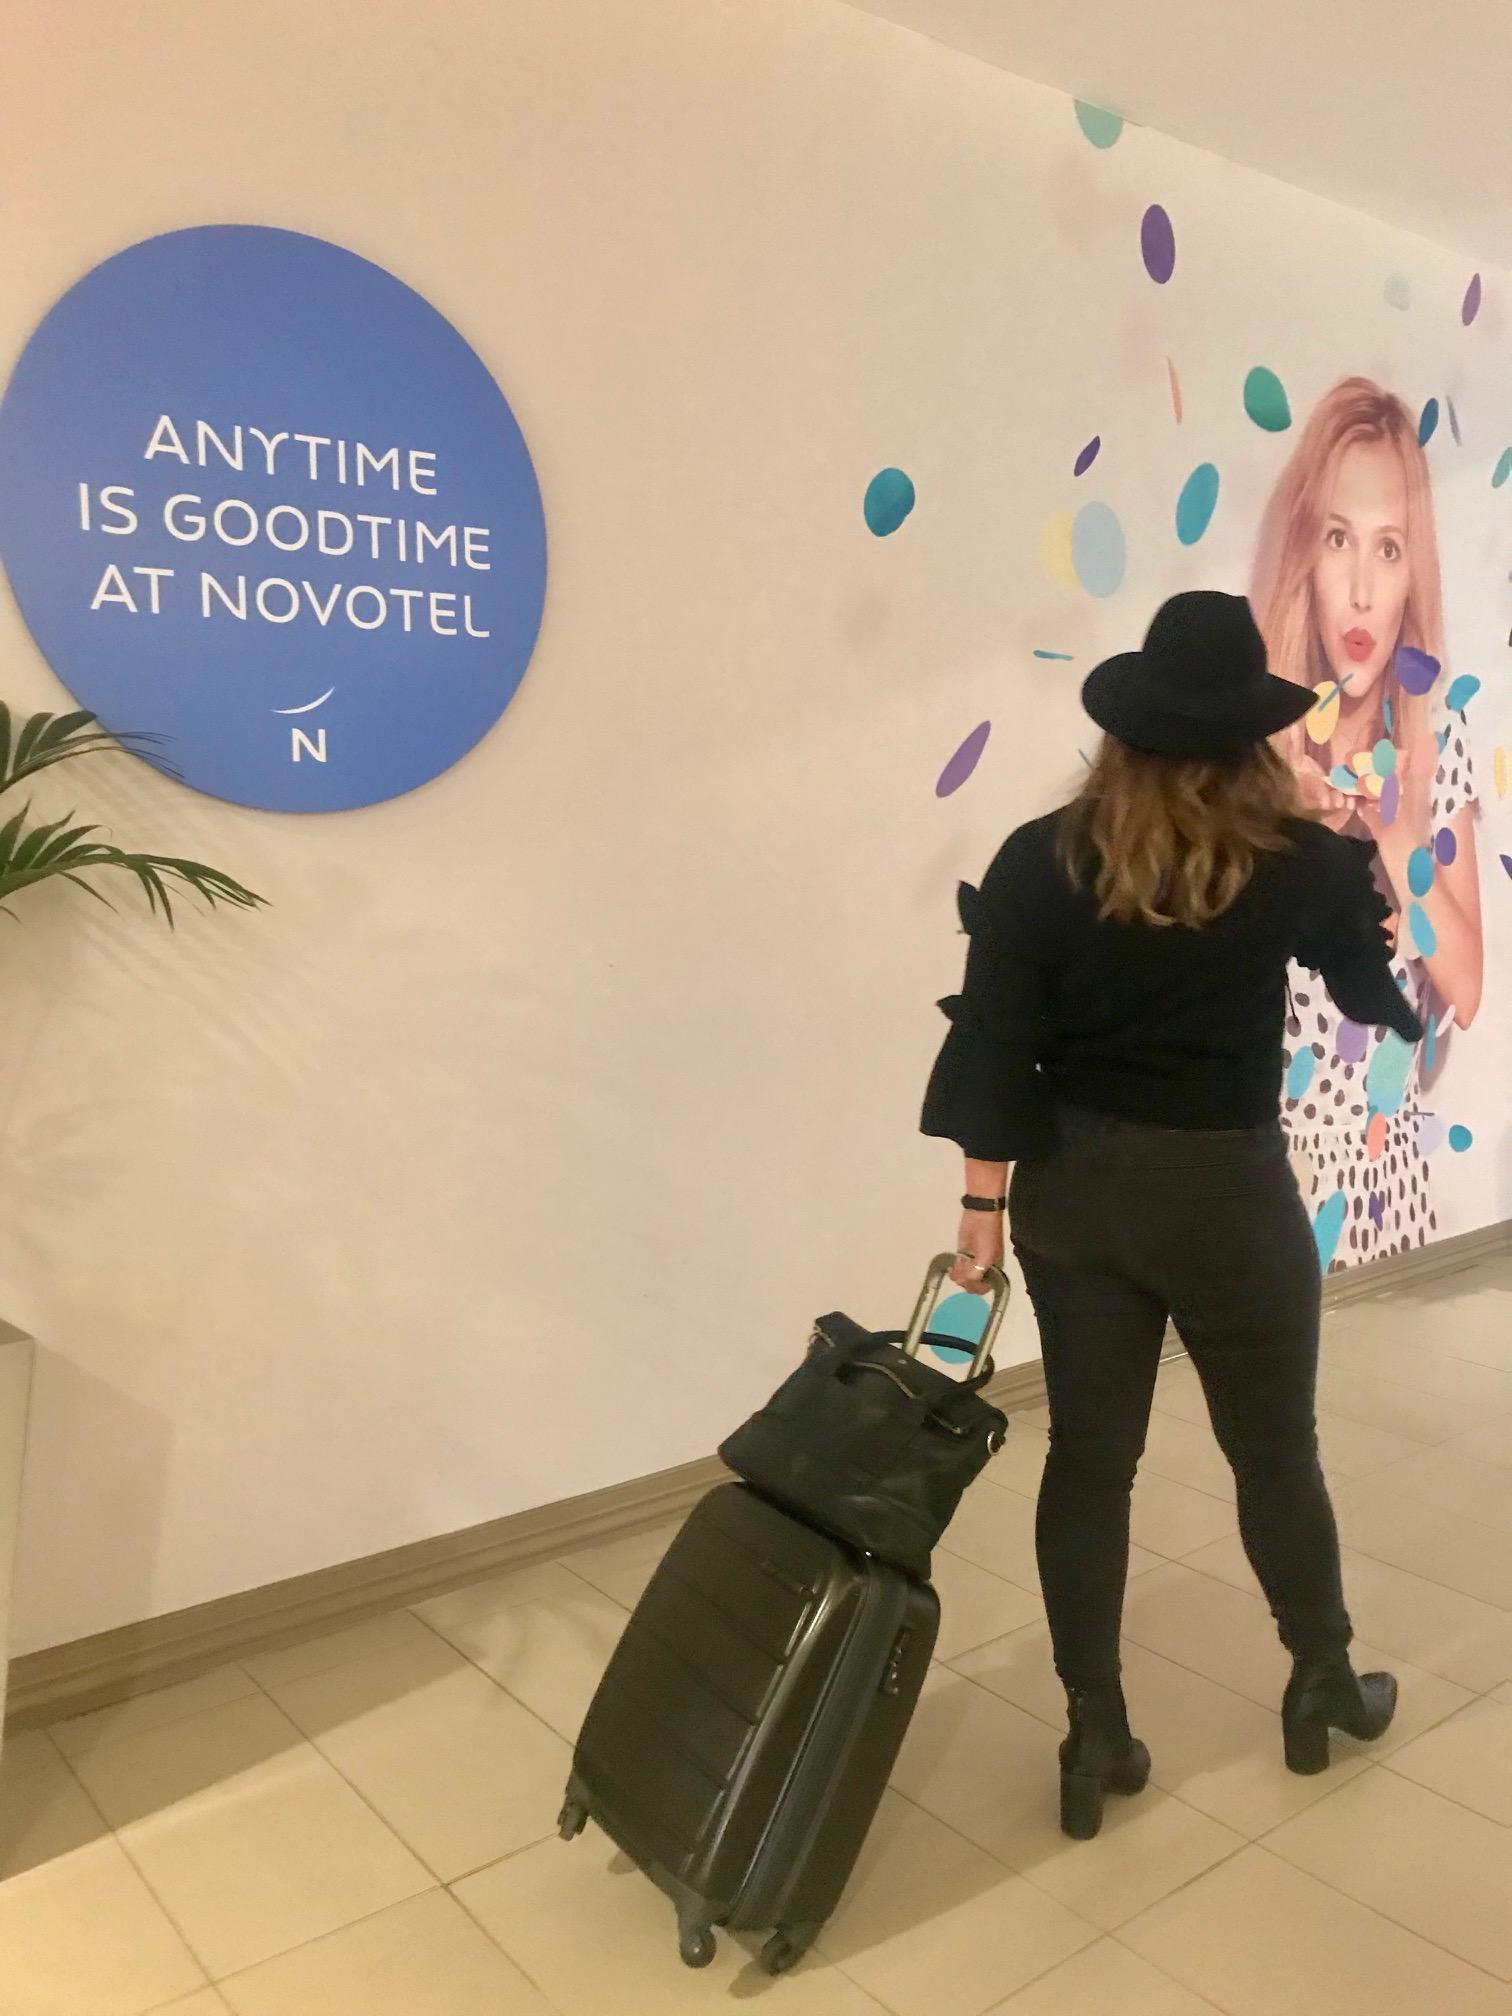 St Kilda Novotel – A Relaxing Melbourne break